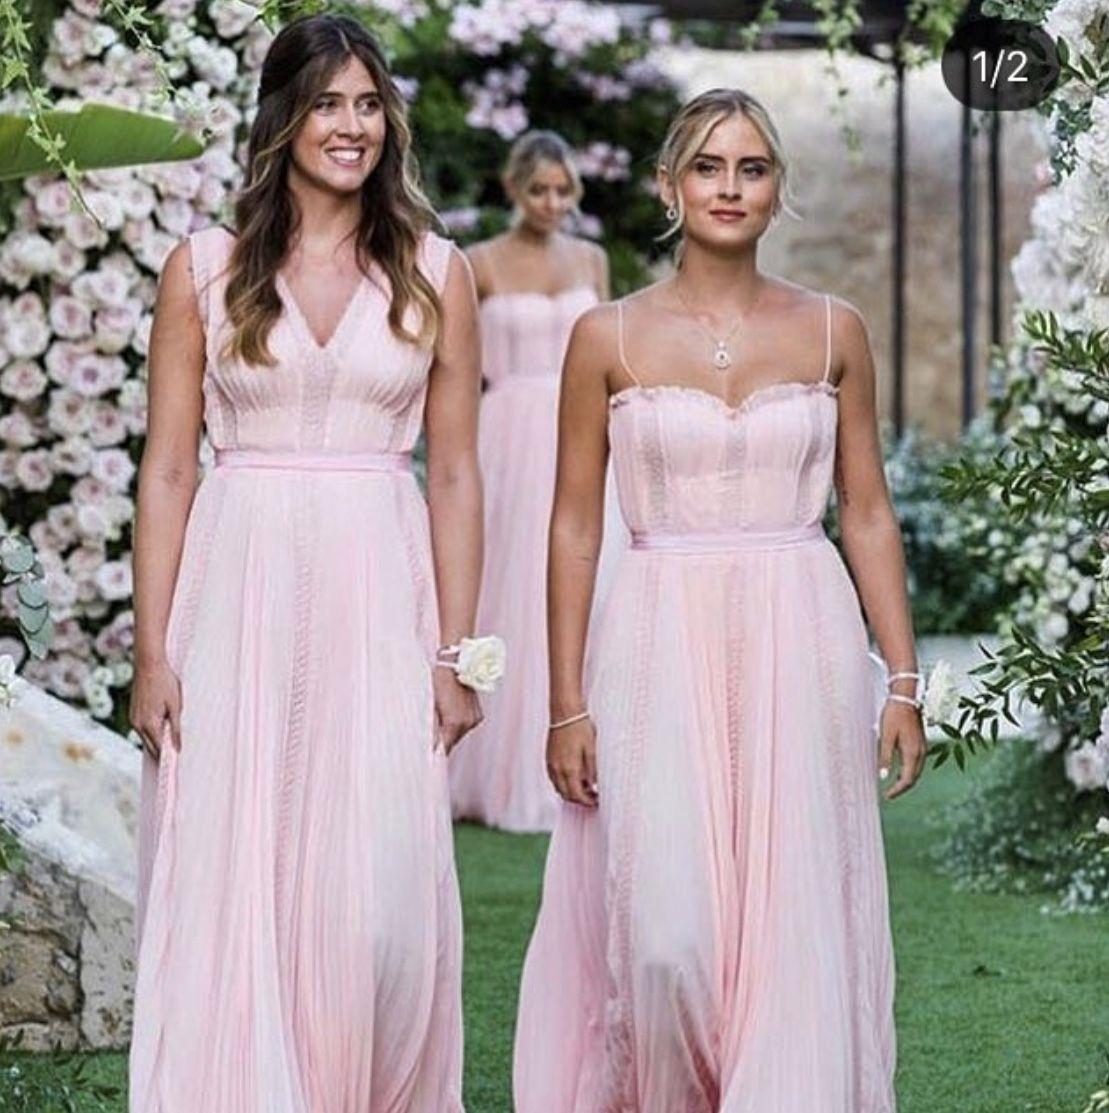 ddfa4b9a4550 Chiara Ferragni bridesmaids Valentina Ferragni